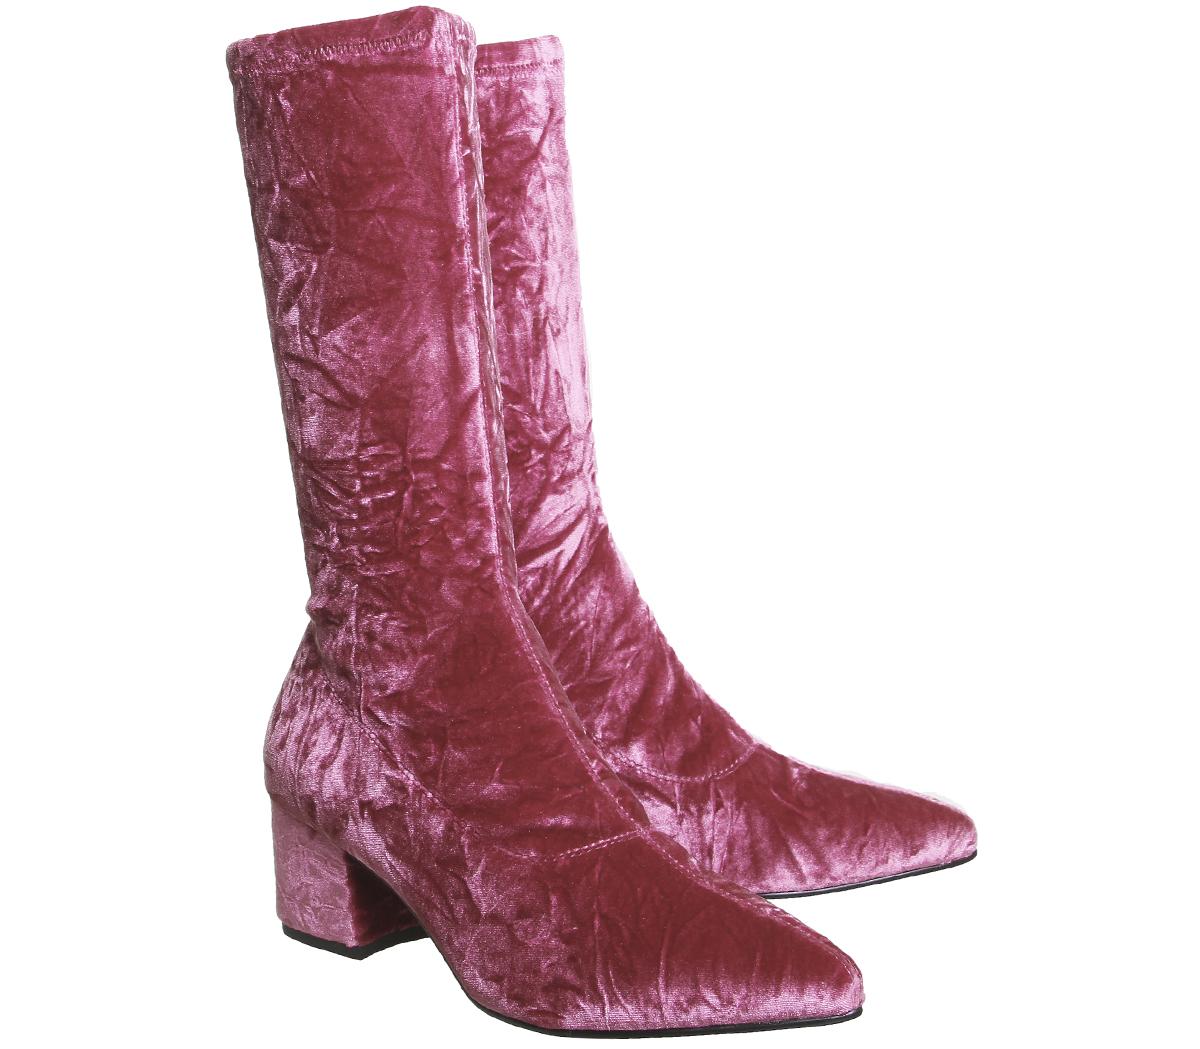 Damenschuhe Vagabond VELVET Mya Tall Stiefel PINK VELVET Vagabond Stiefel be76e9